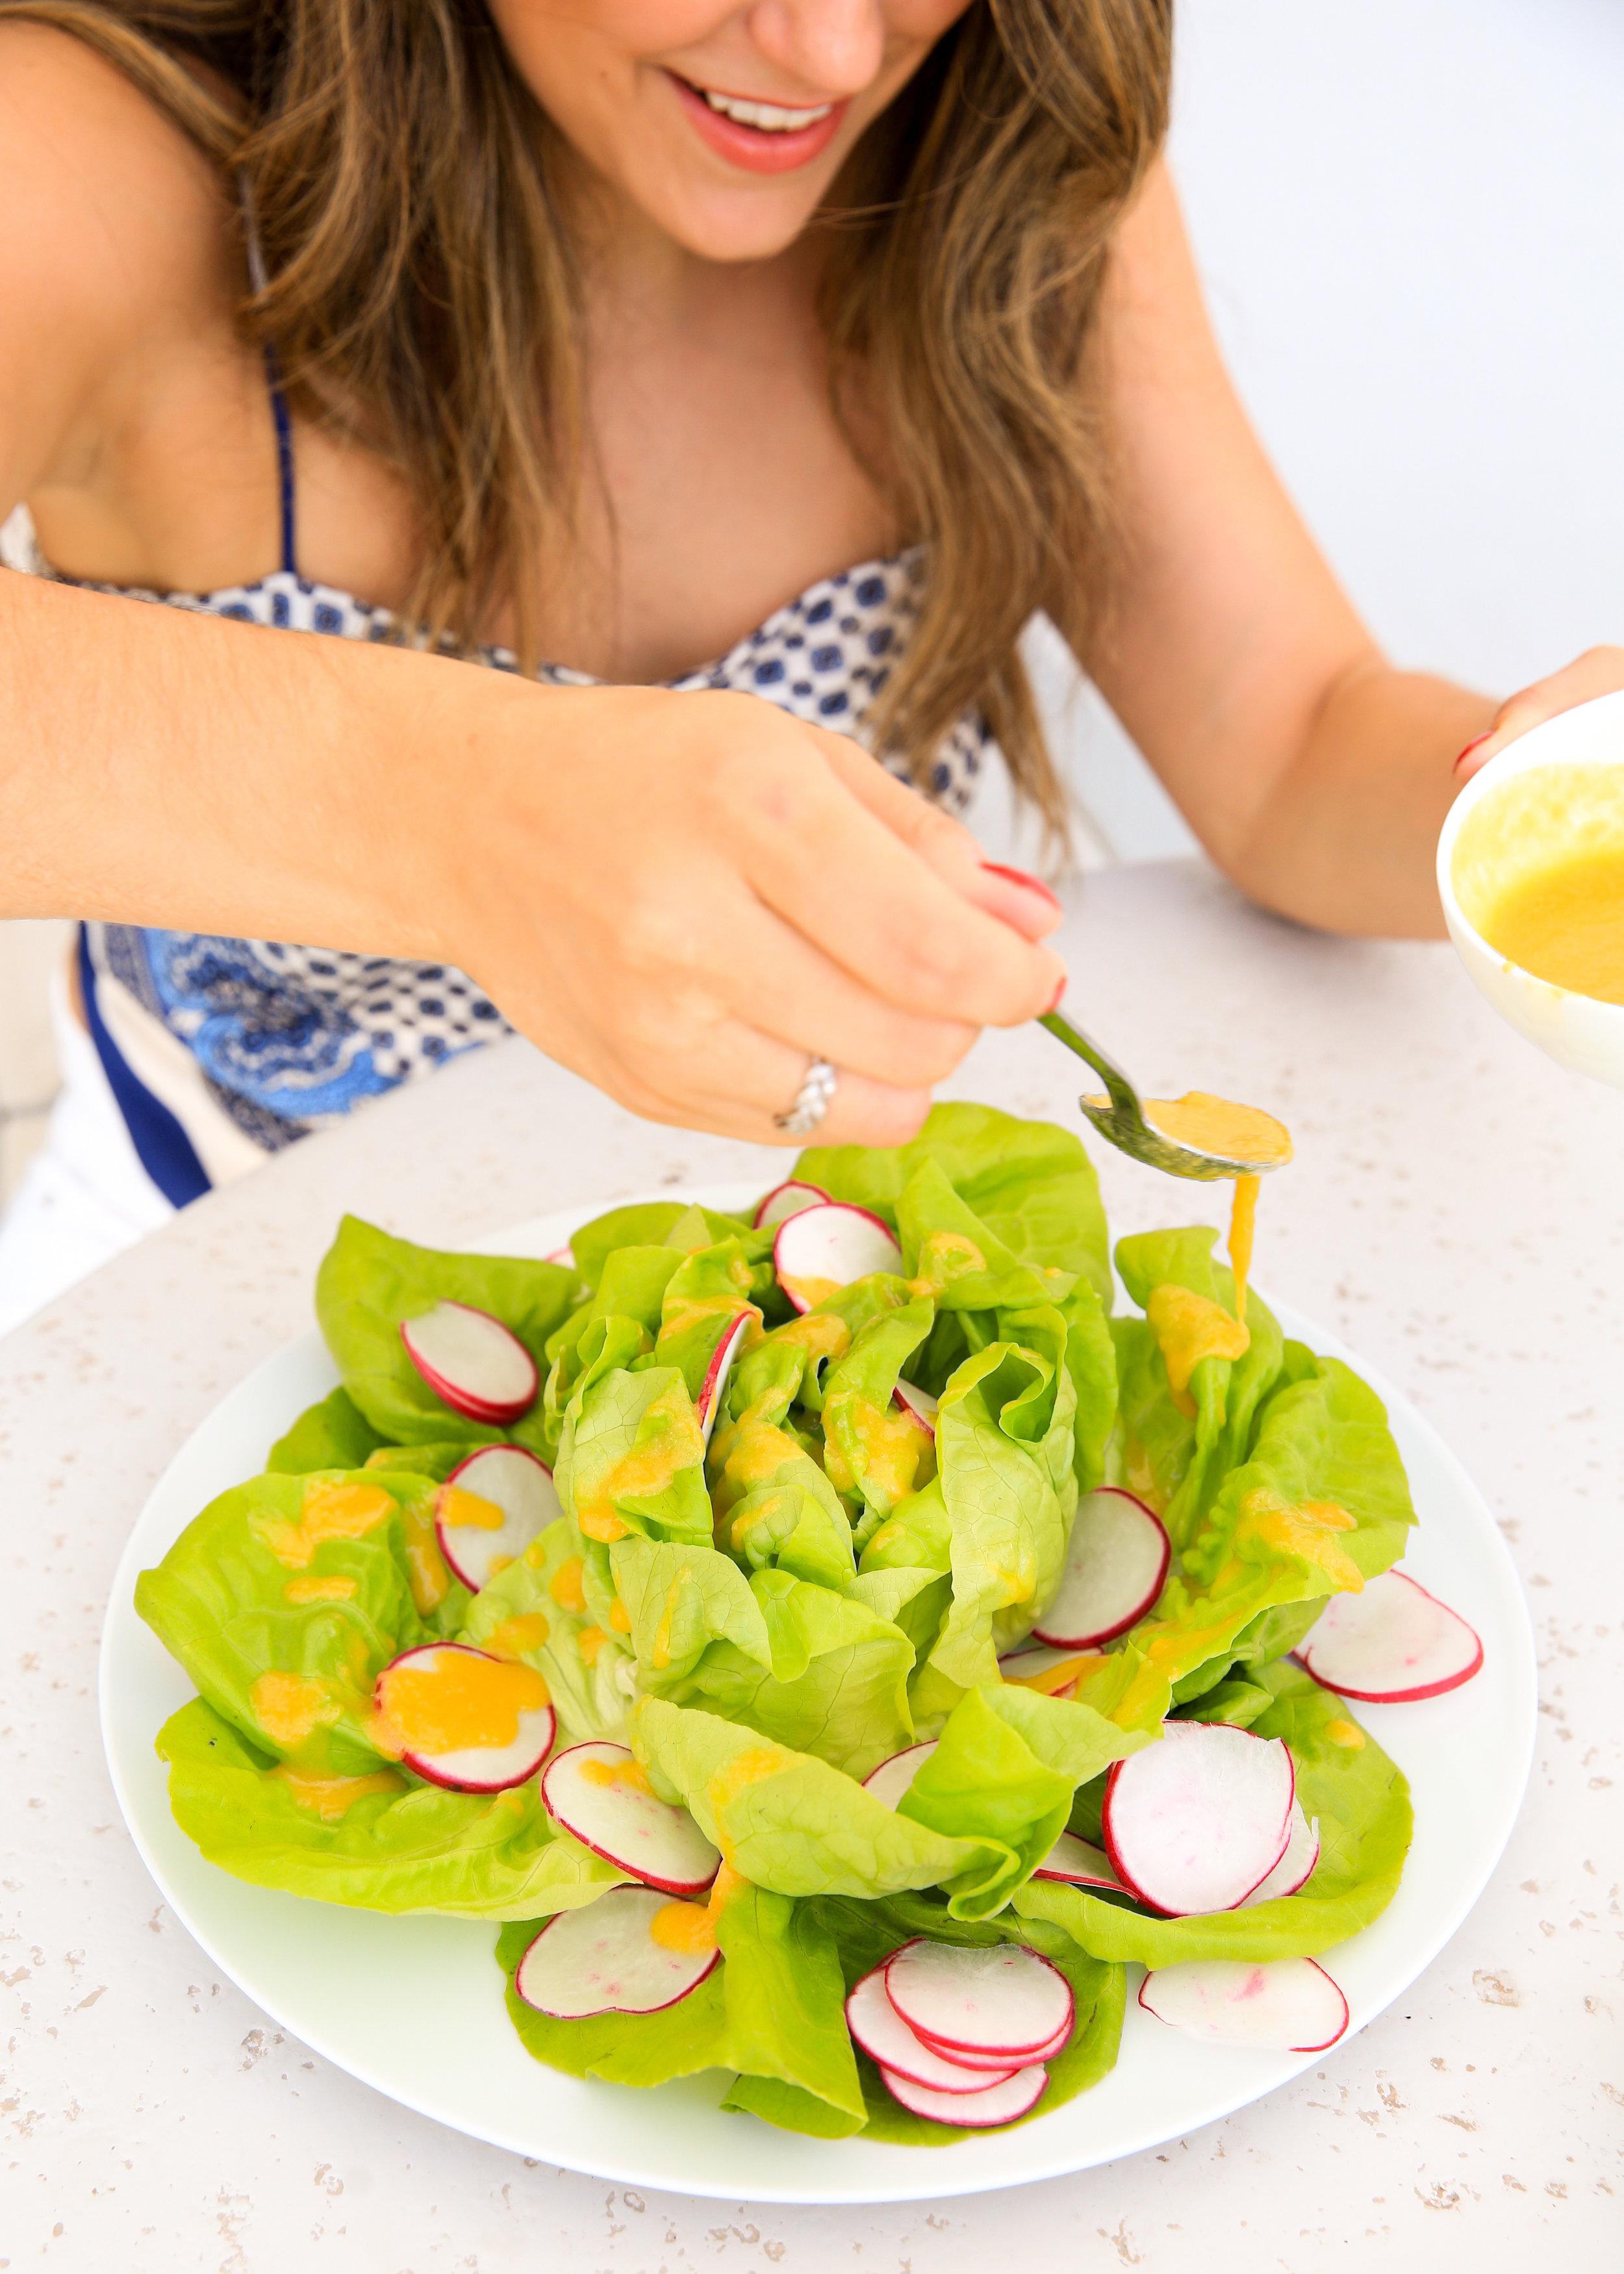 Mango vinaigrette to add flavor to any salad